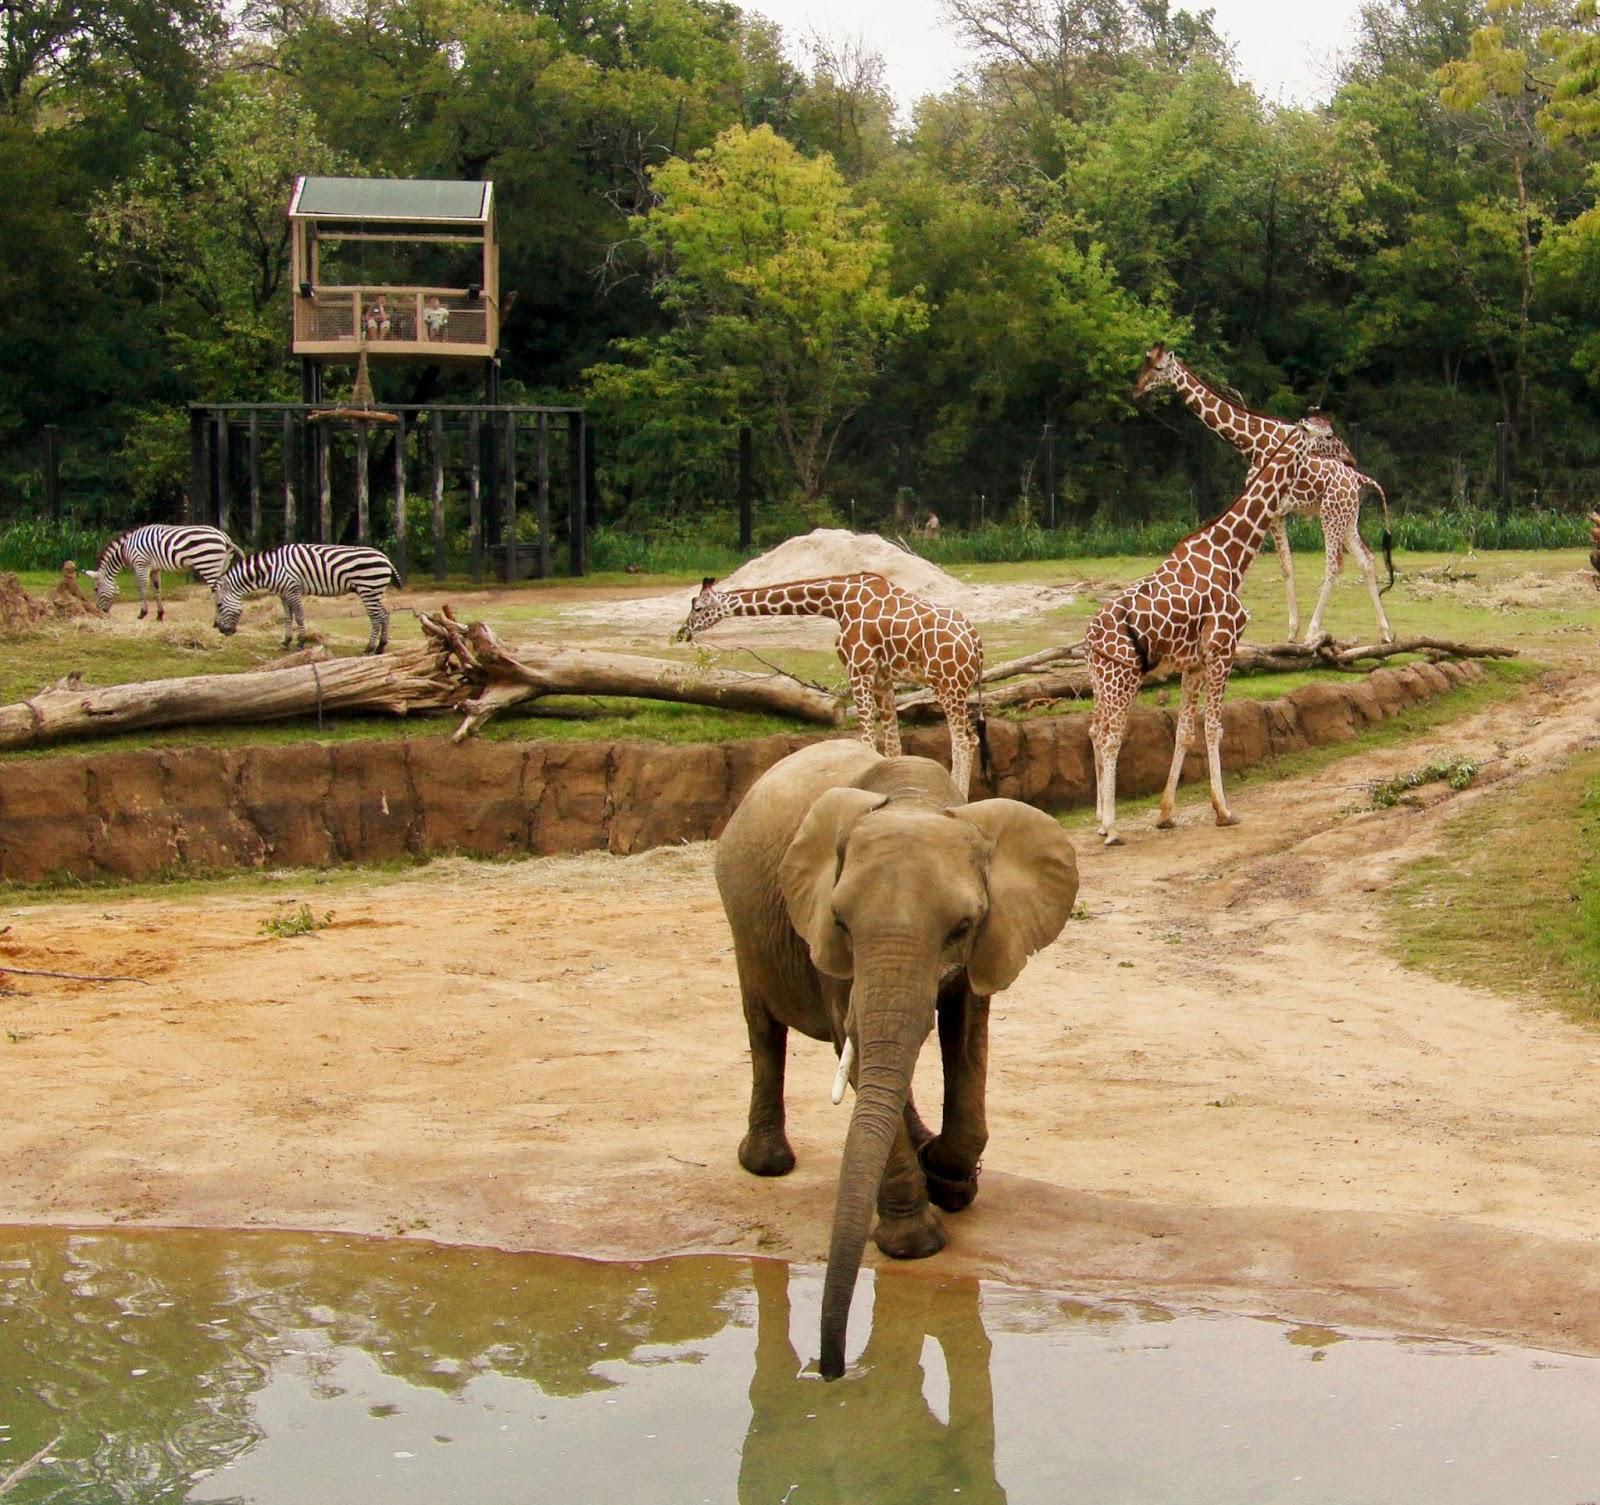 Dallas Zoo S Giants Of The Savanna Named 3 Zoo Habitat In